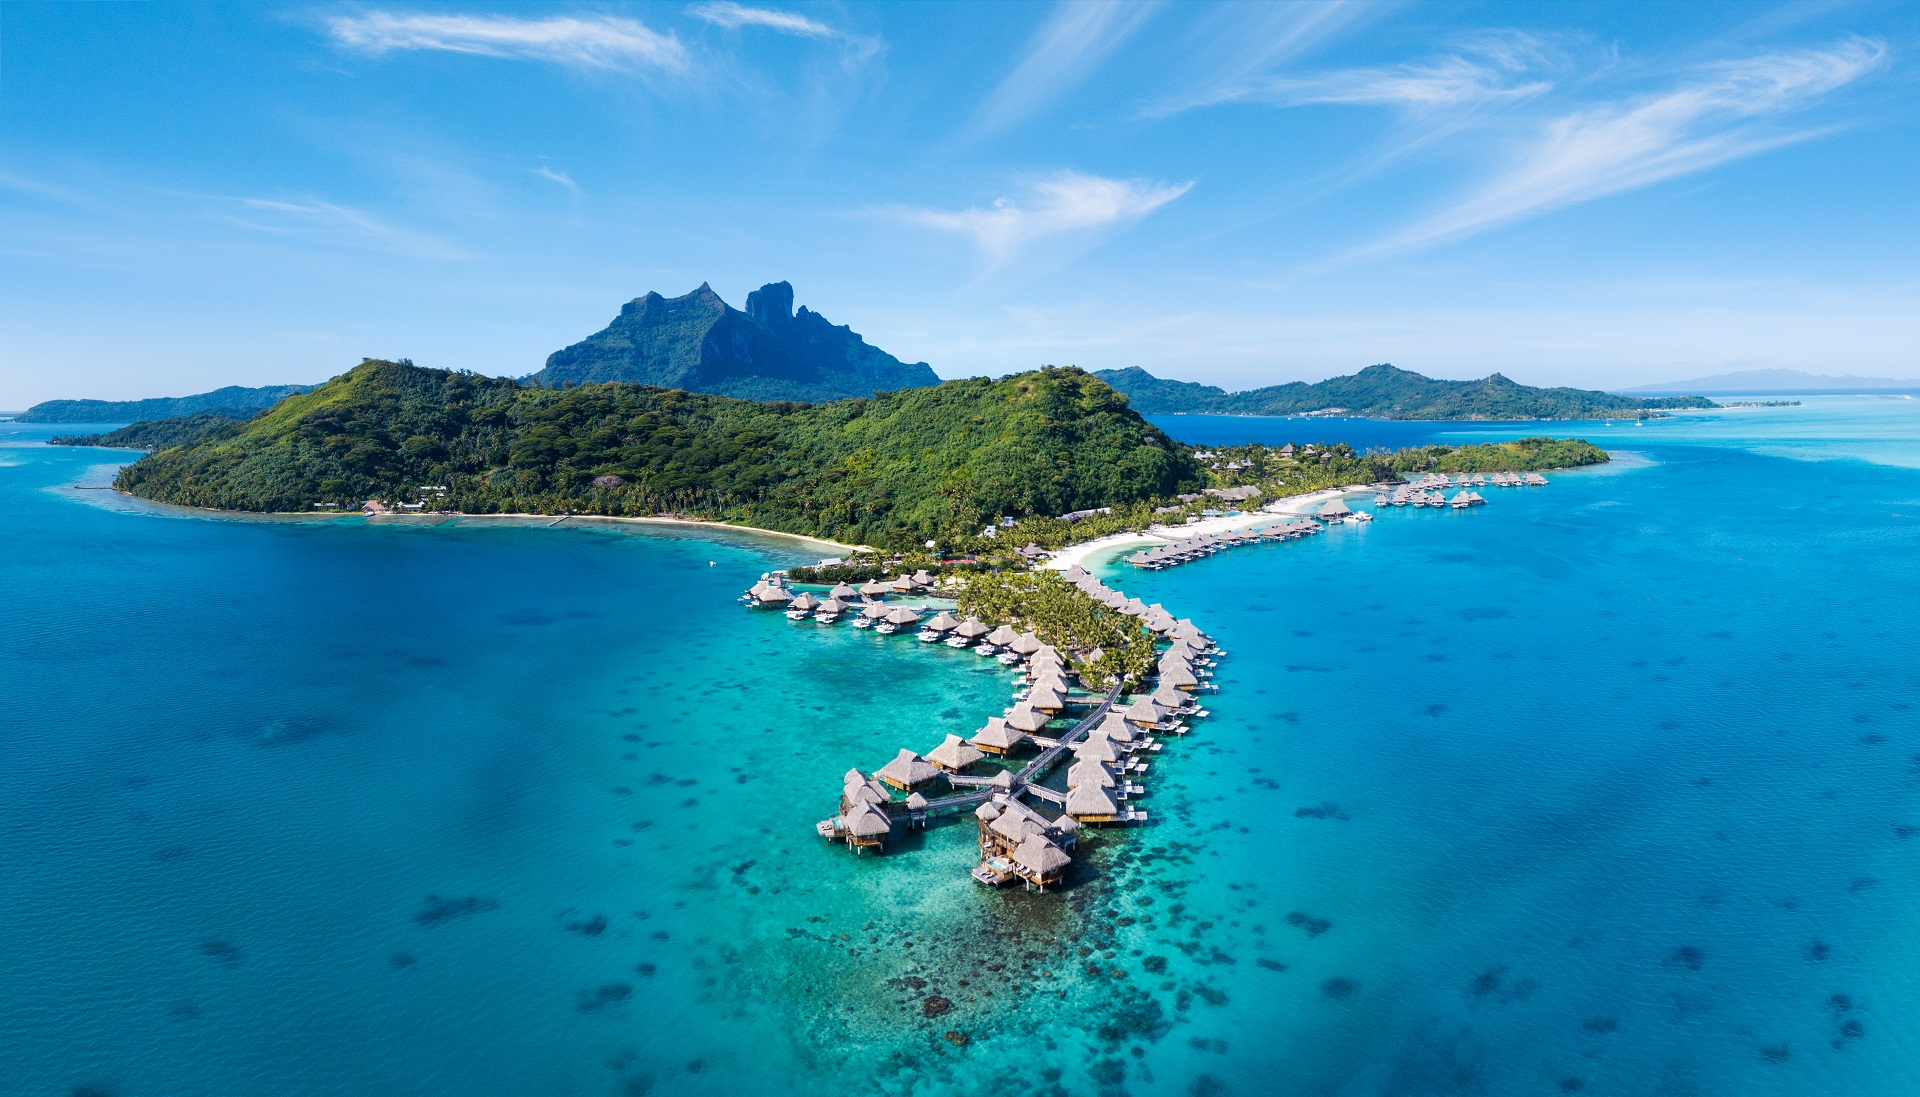 Polinezja Francuska Wyspy Luksus Na Koncu Swiata Dreamgo